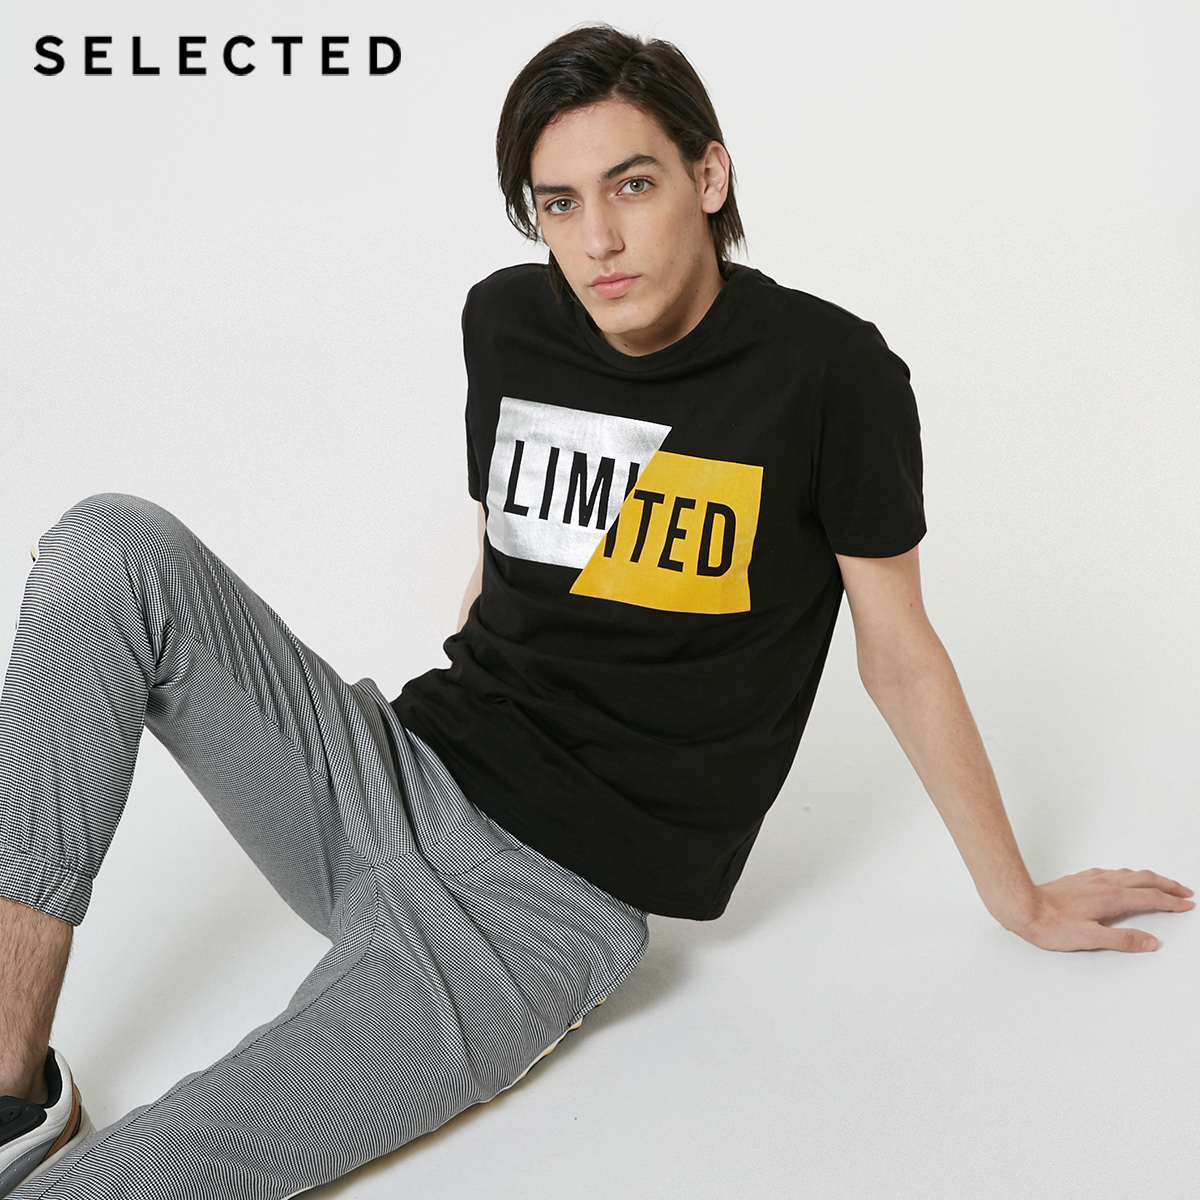 SELECTED Men's Summer 100% Cotton Flocking Print Short-sleeved T-shirt S|419101534